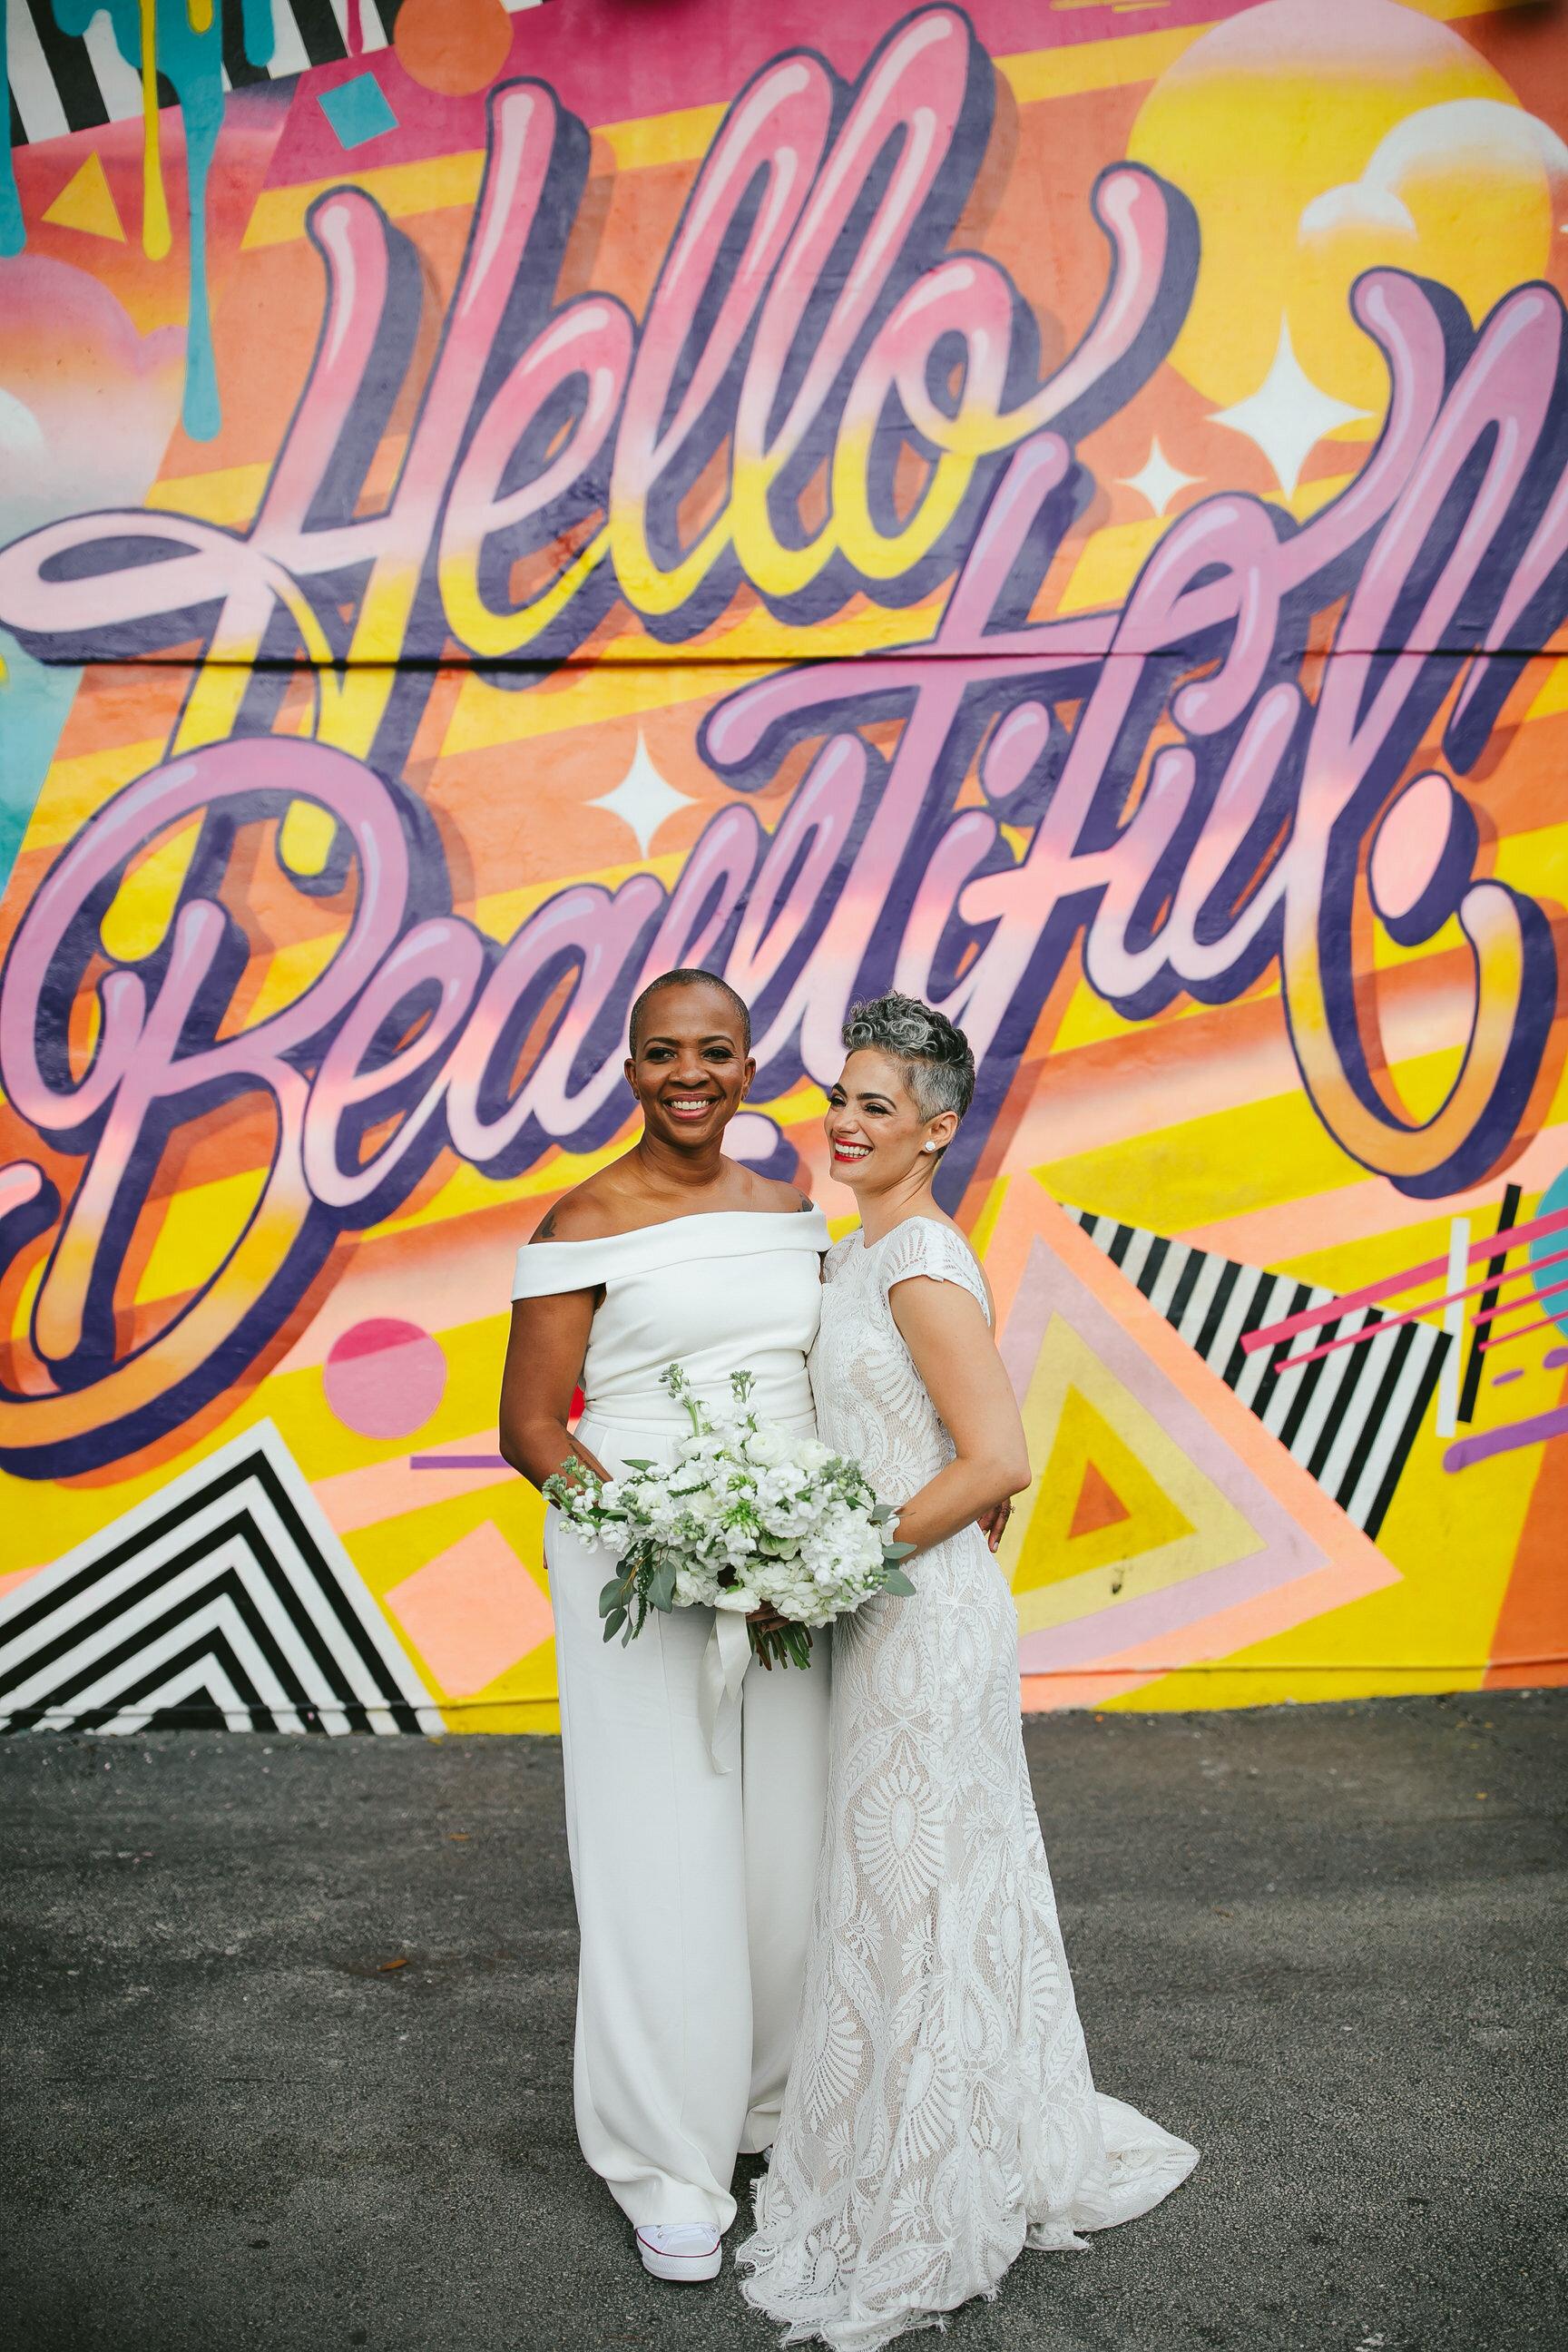 Hello Beautiful Mural Two Brides Wynwood Walls Miami